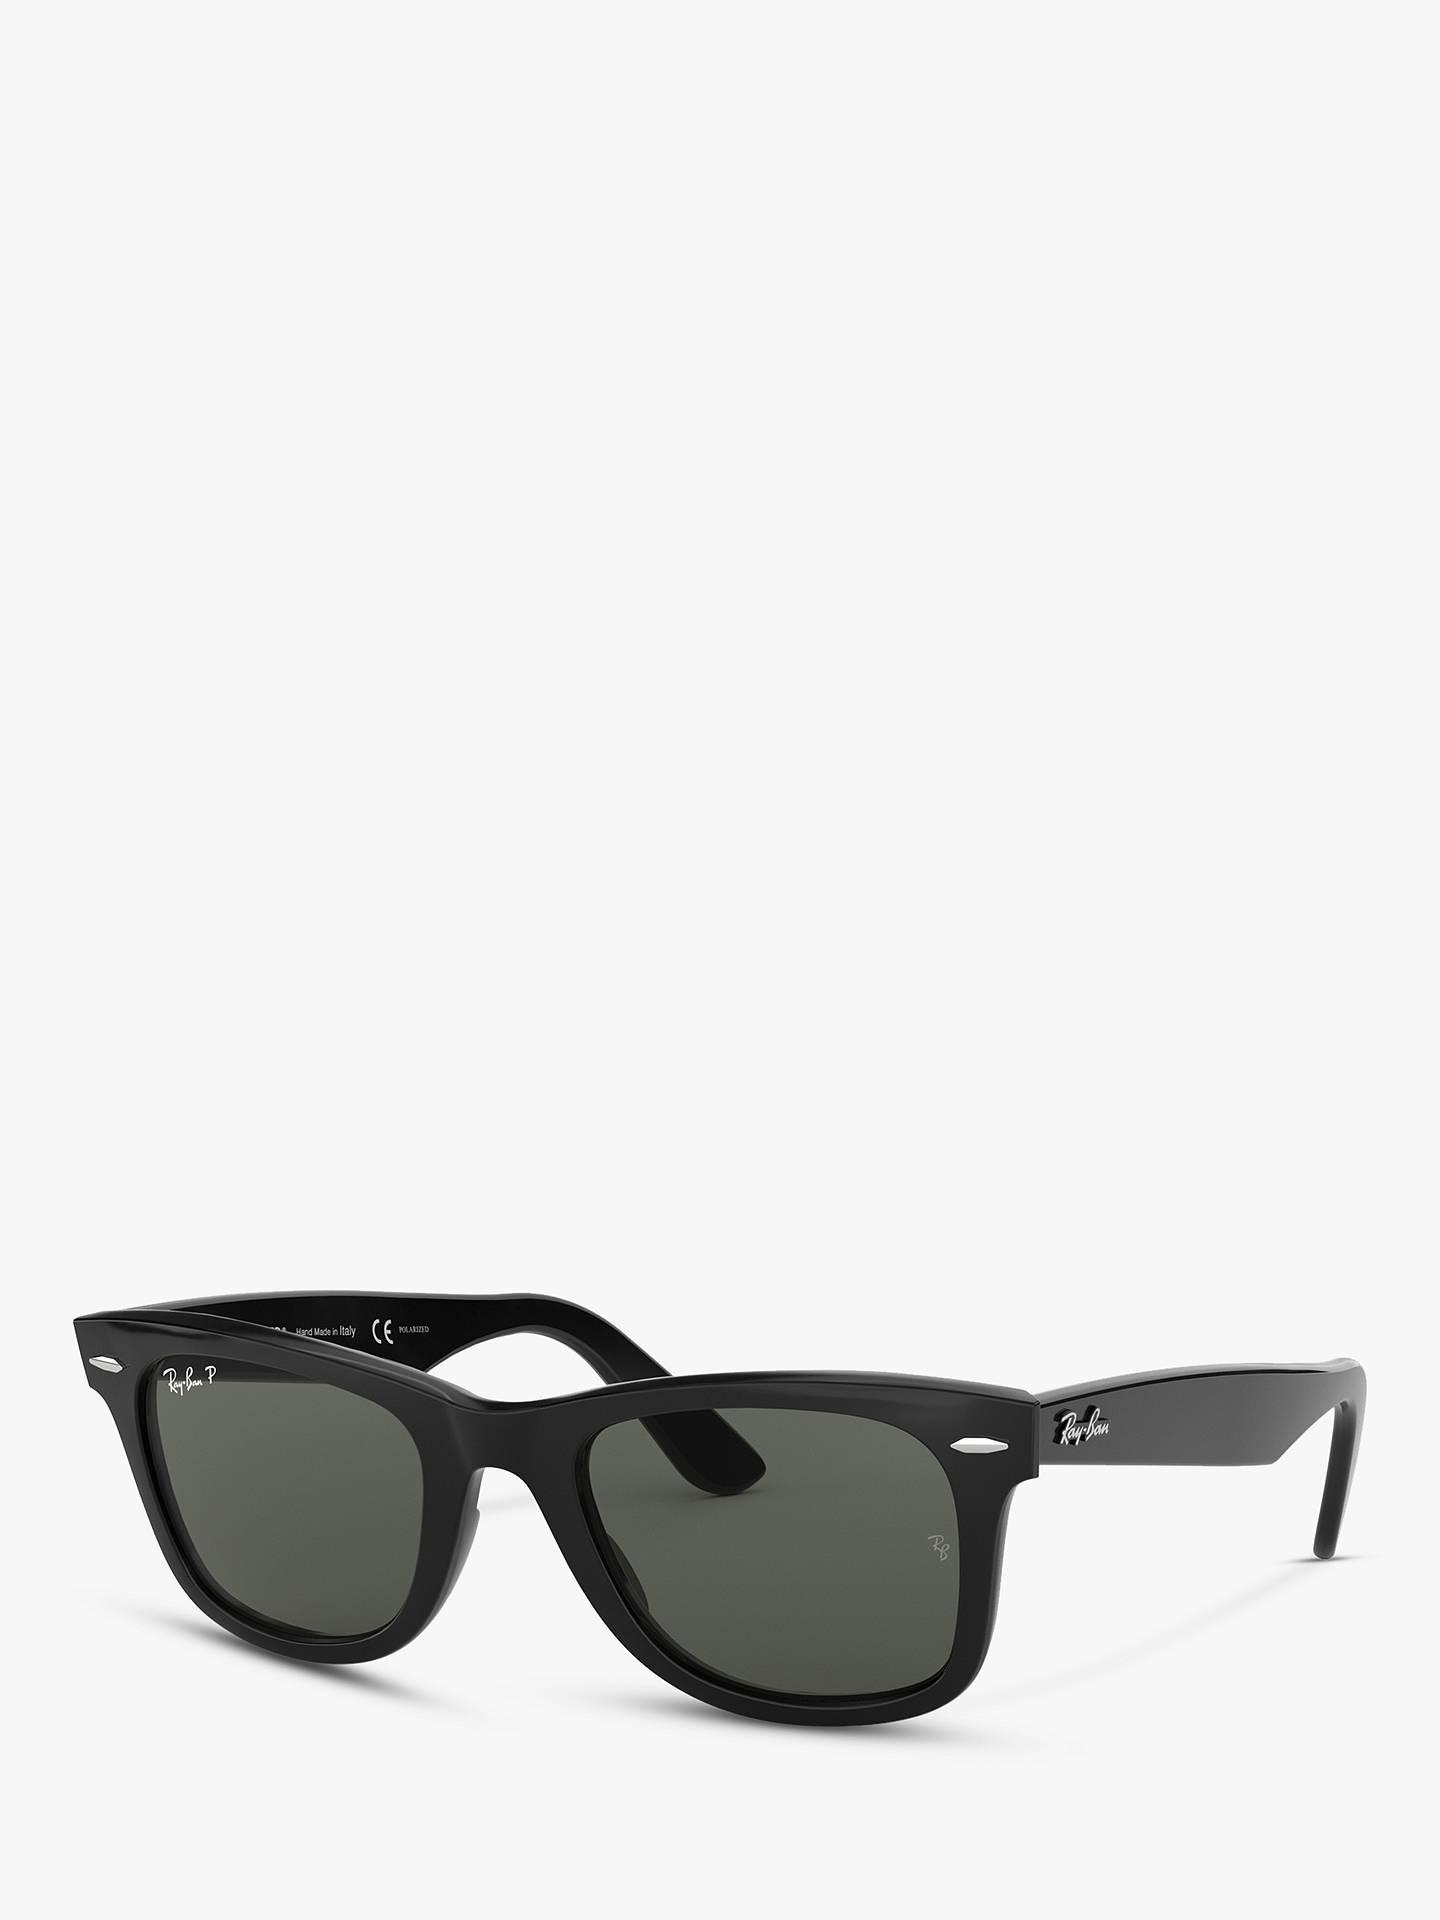 8efe7728dea4 Buy Ray-Ban RB2140 Polarised Wayfarer Sunglasses, Black Online at  johnlewis.com ...